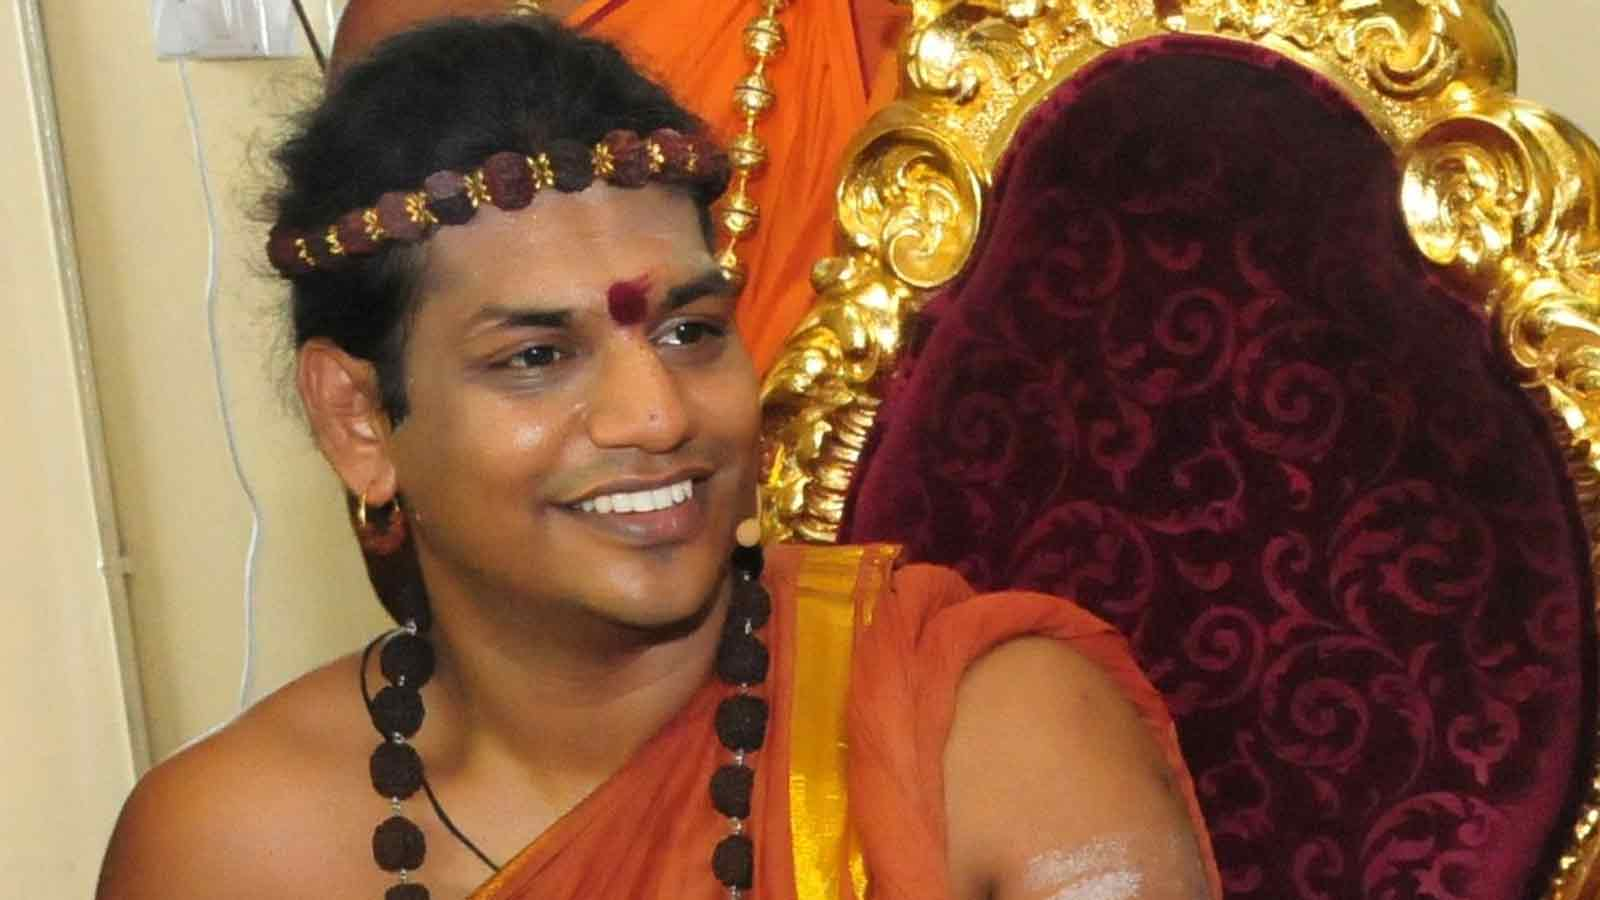 self-styled-godman-nithyananda-booked-2-ashram-managers-arrested